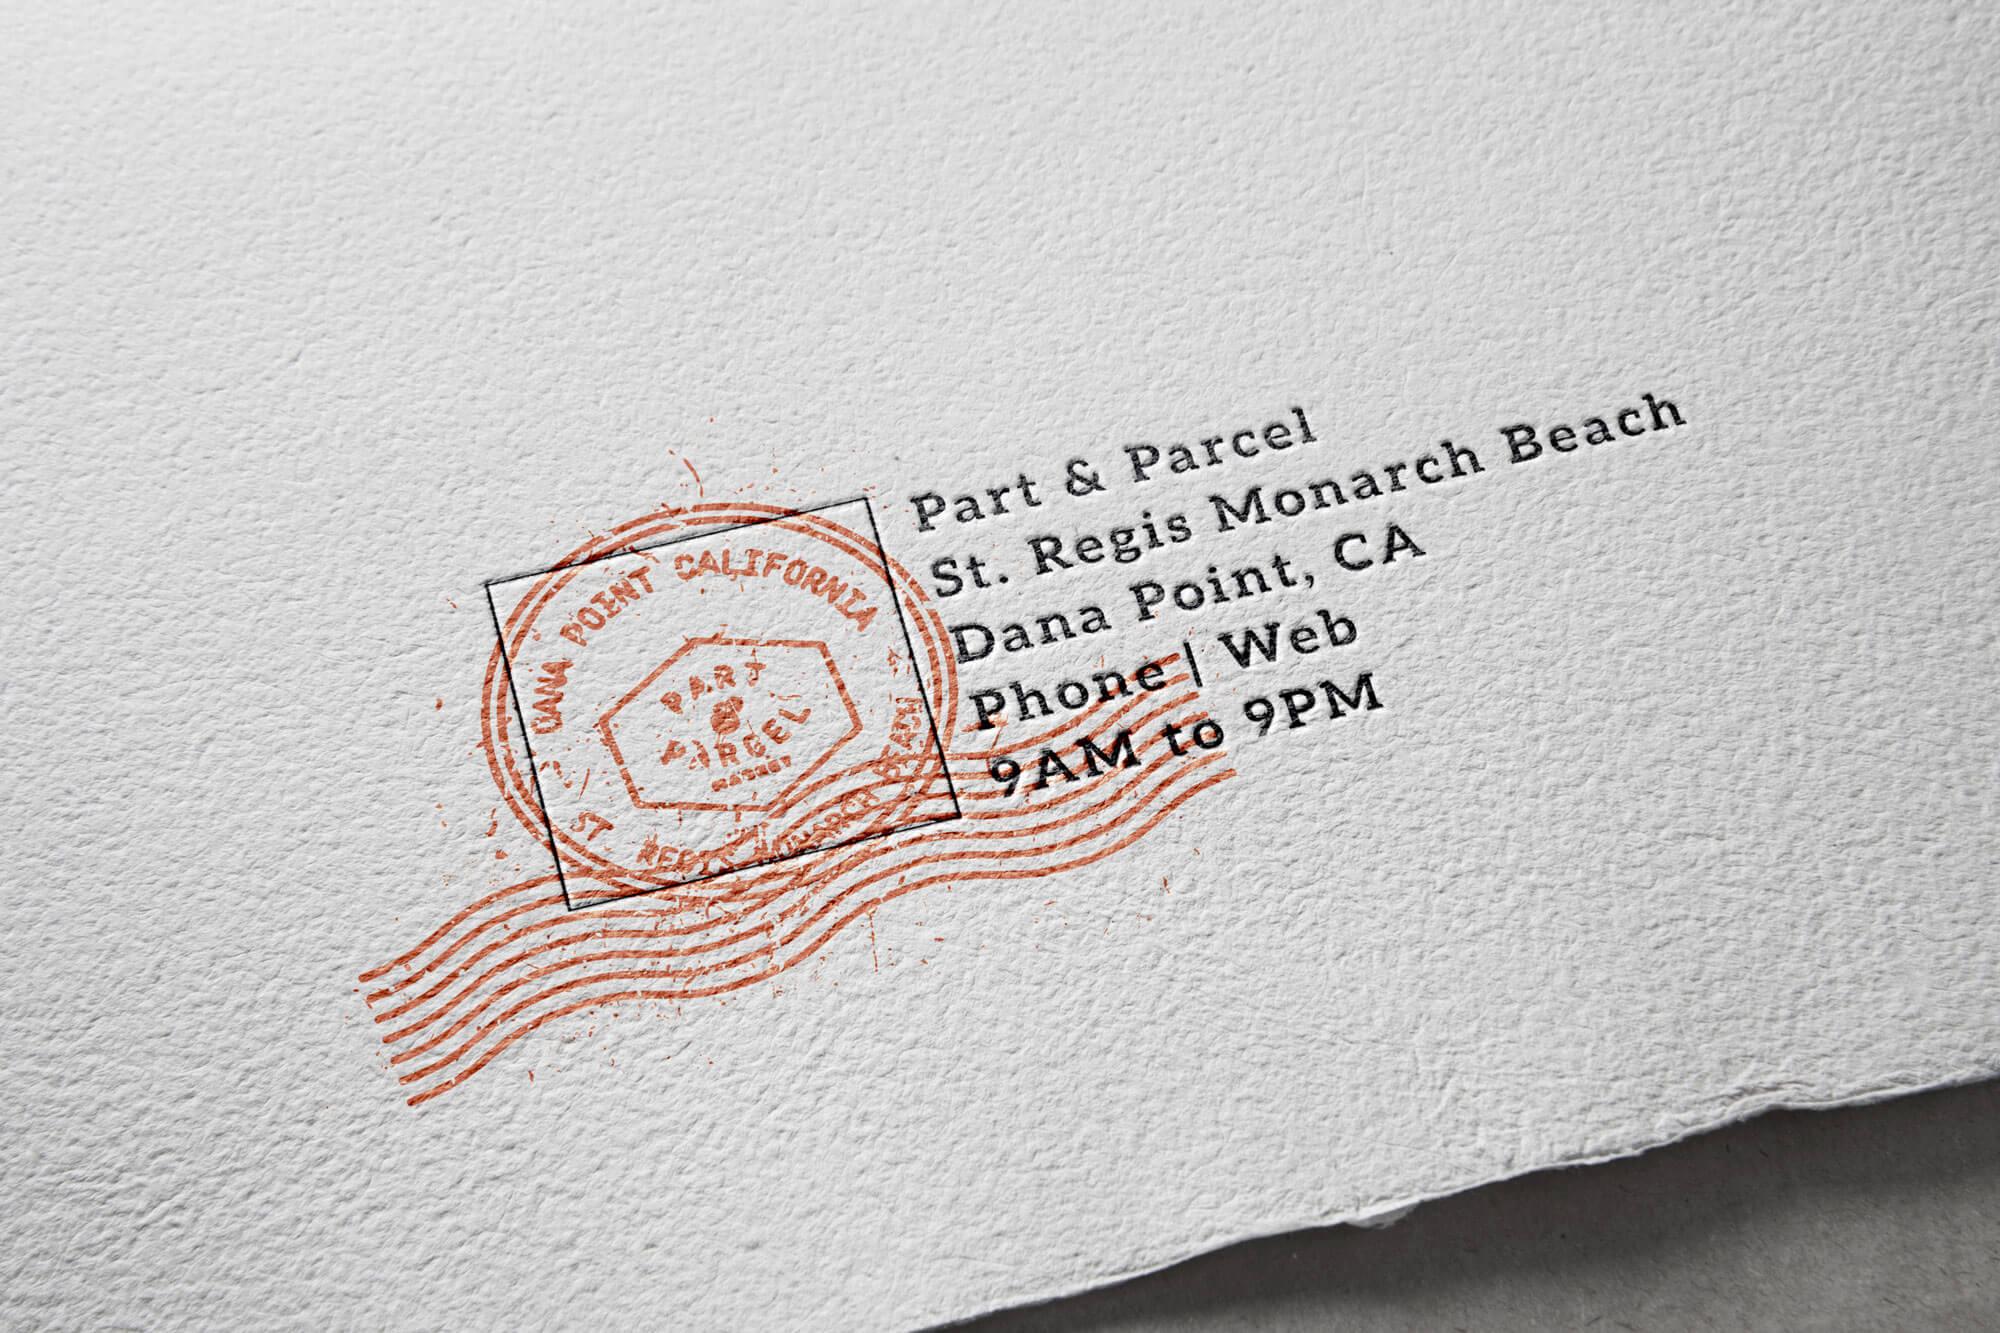 RBS_St_Regis_Monarch_Beach__PP_Stamp